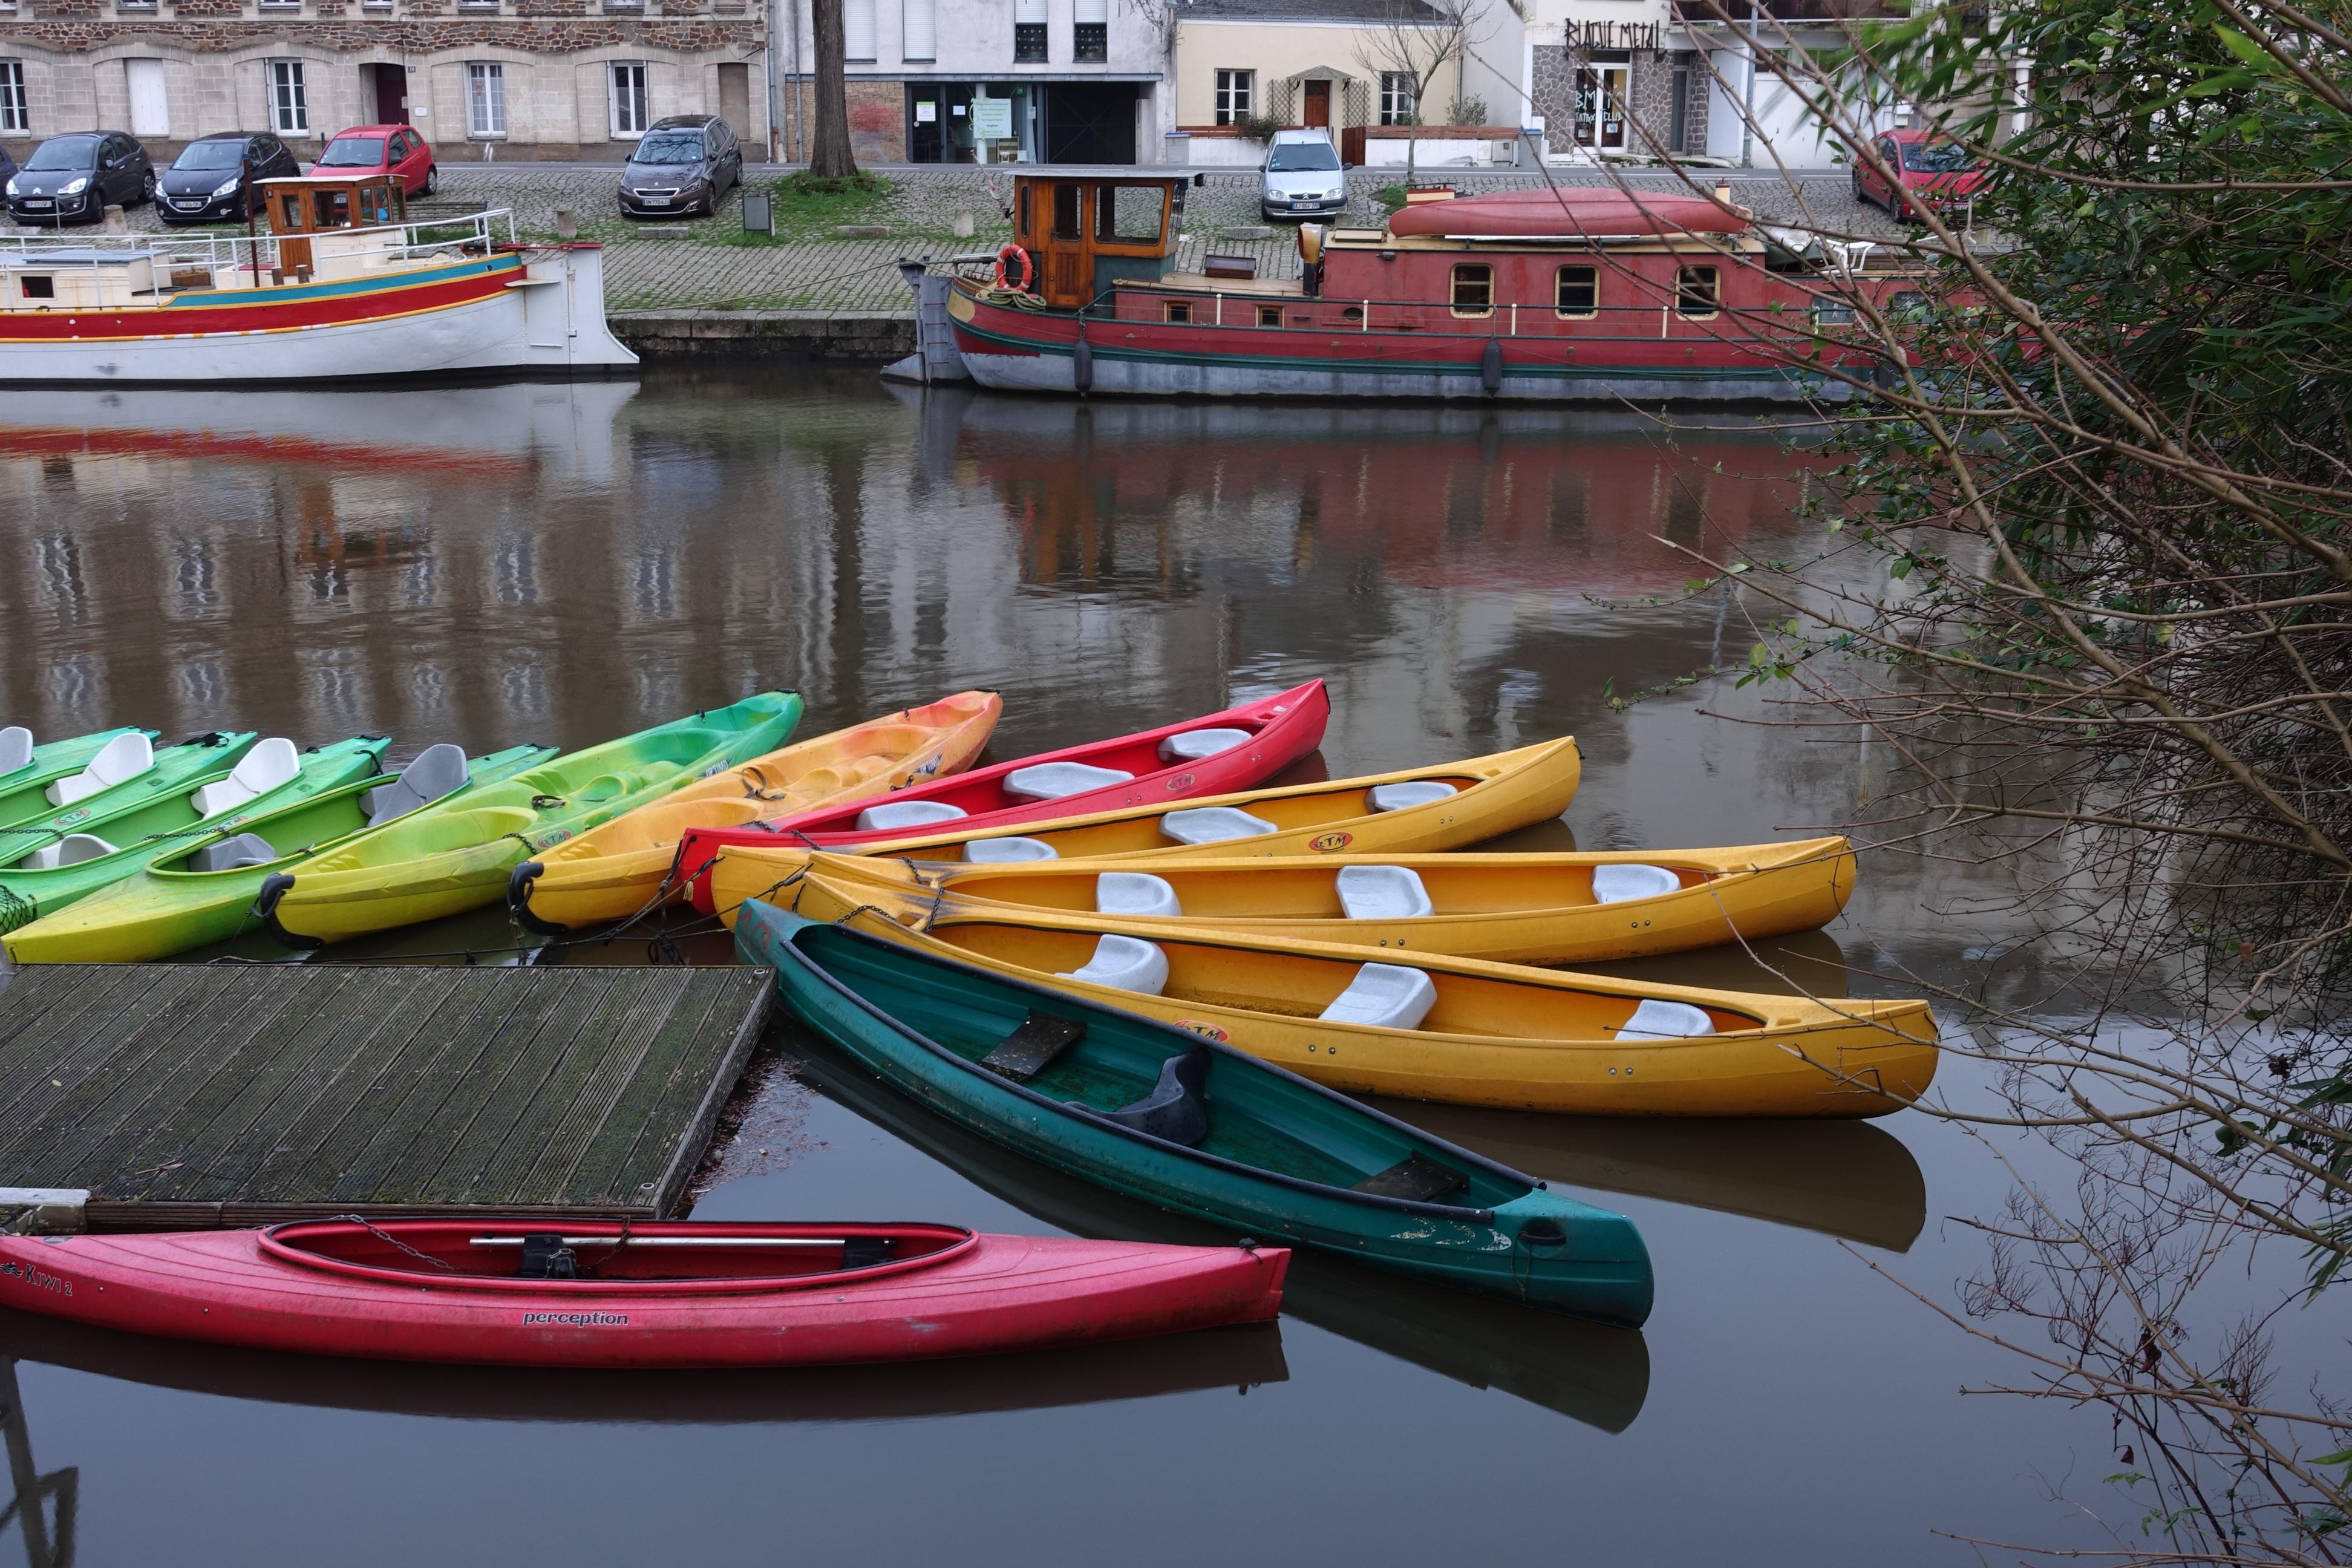 free images boat river canoe paddle vehicle kayak sports equipment colors boating. Black Bedroom Furniture Sets. Home Design Ideas